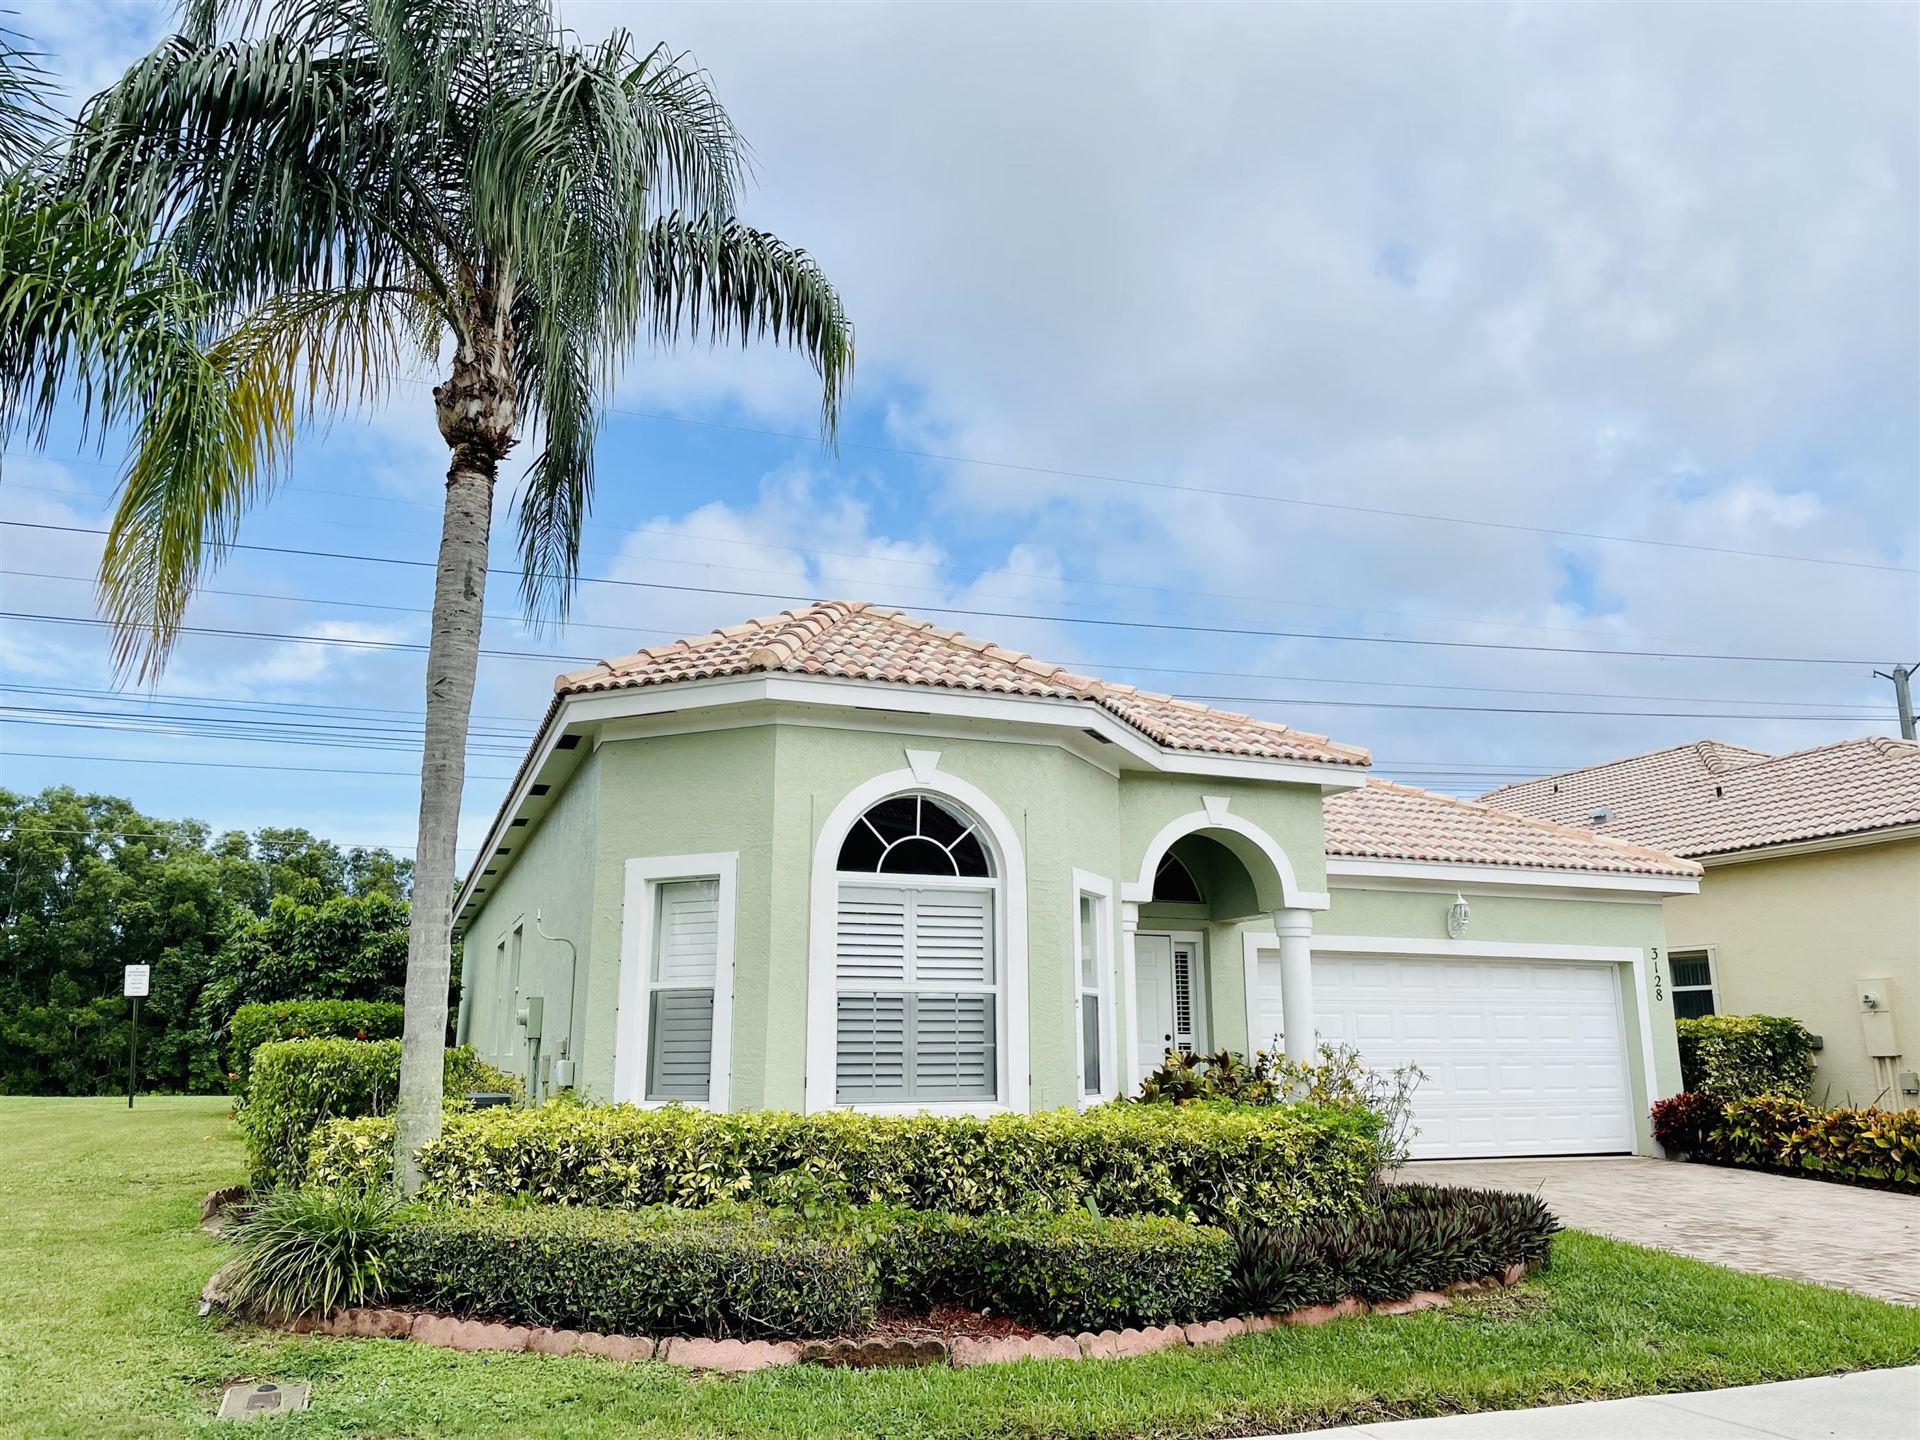 3128 El Camino Real, West Palm Beach, FL 33409 - MLS#: RX-10734892